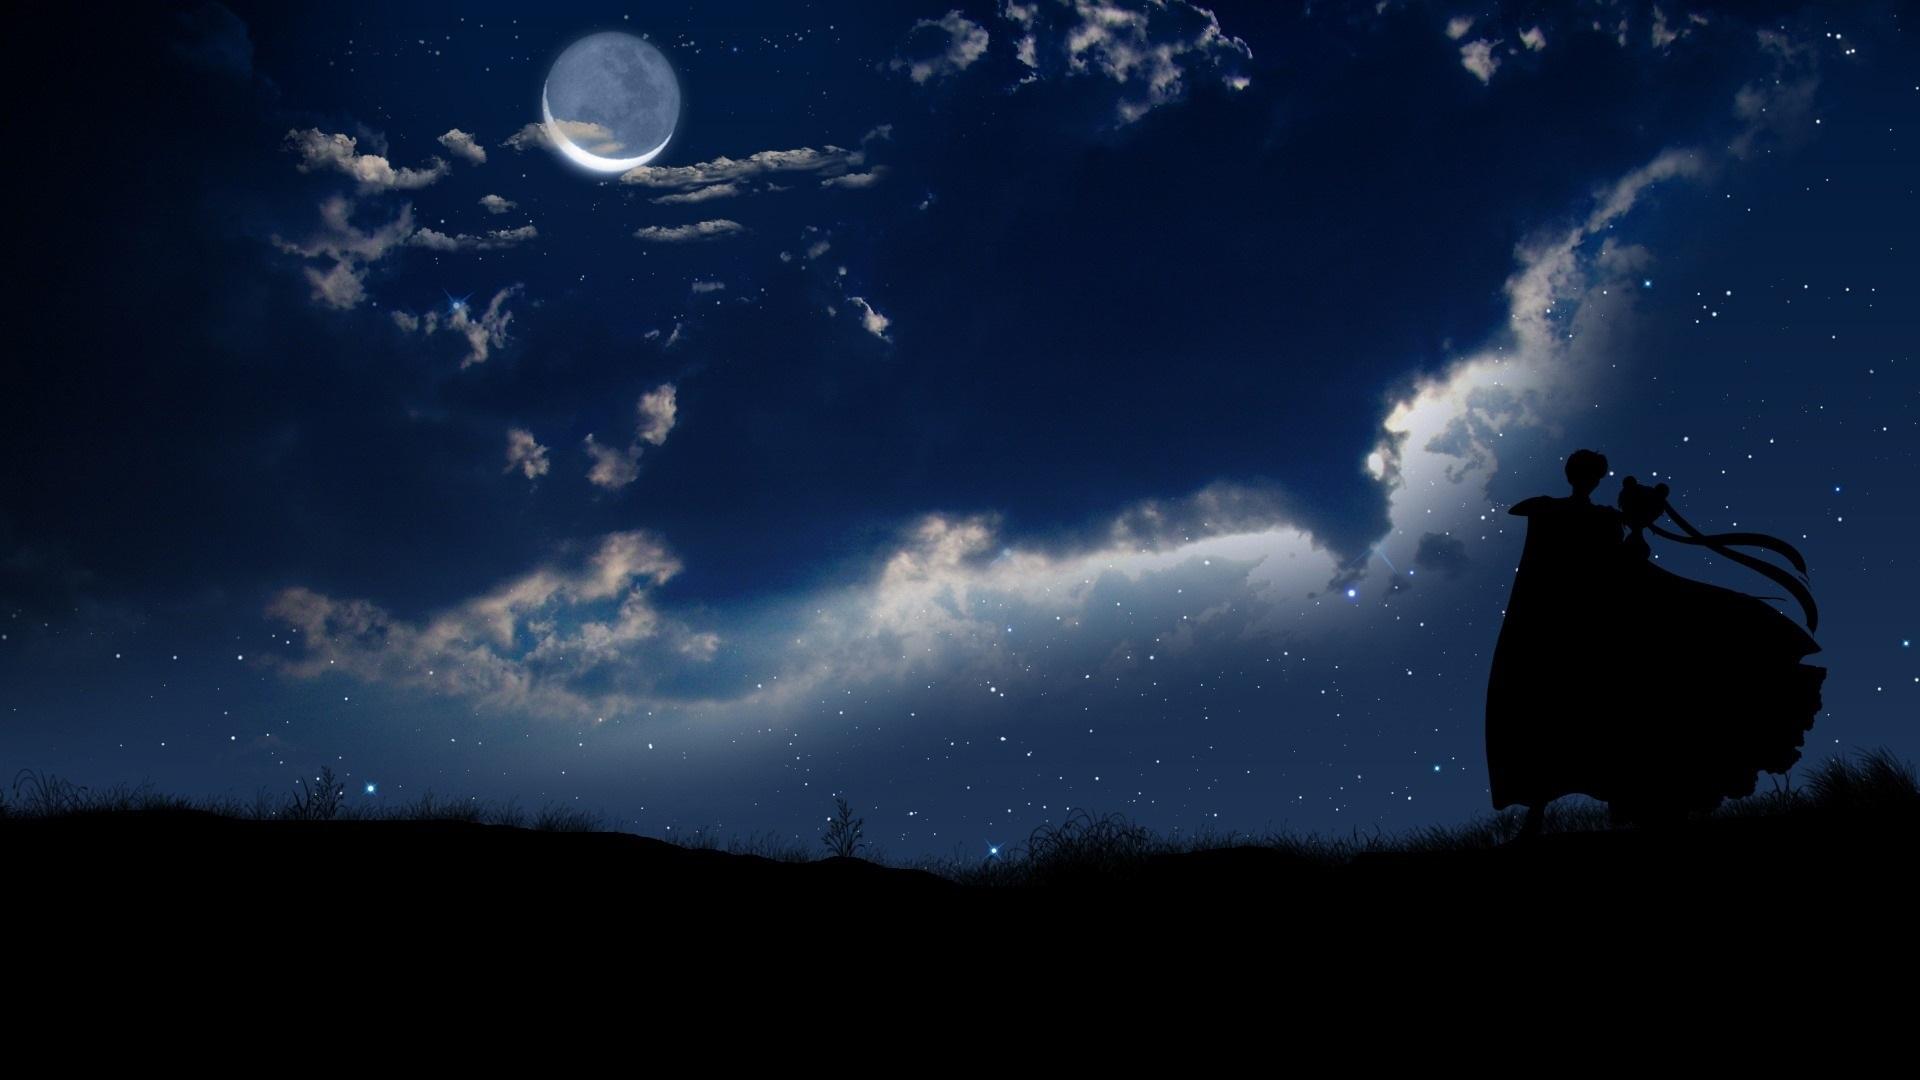 Madara Wallpaper 3d Hd Moon Backgrounds Free Download Pixelstalk Net